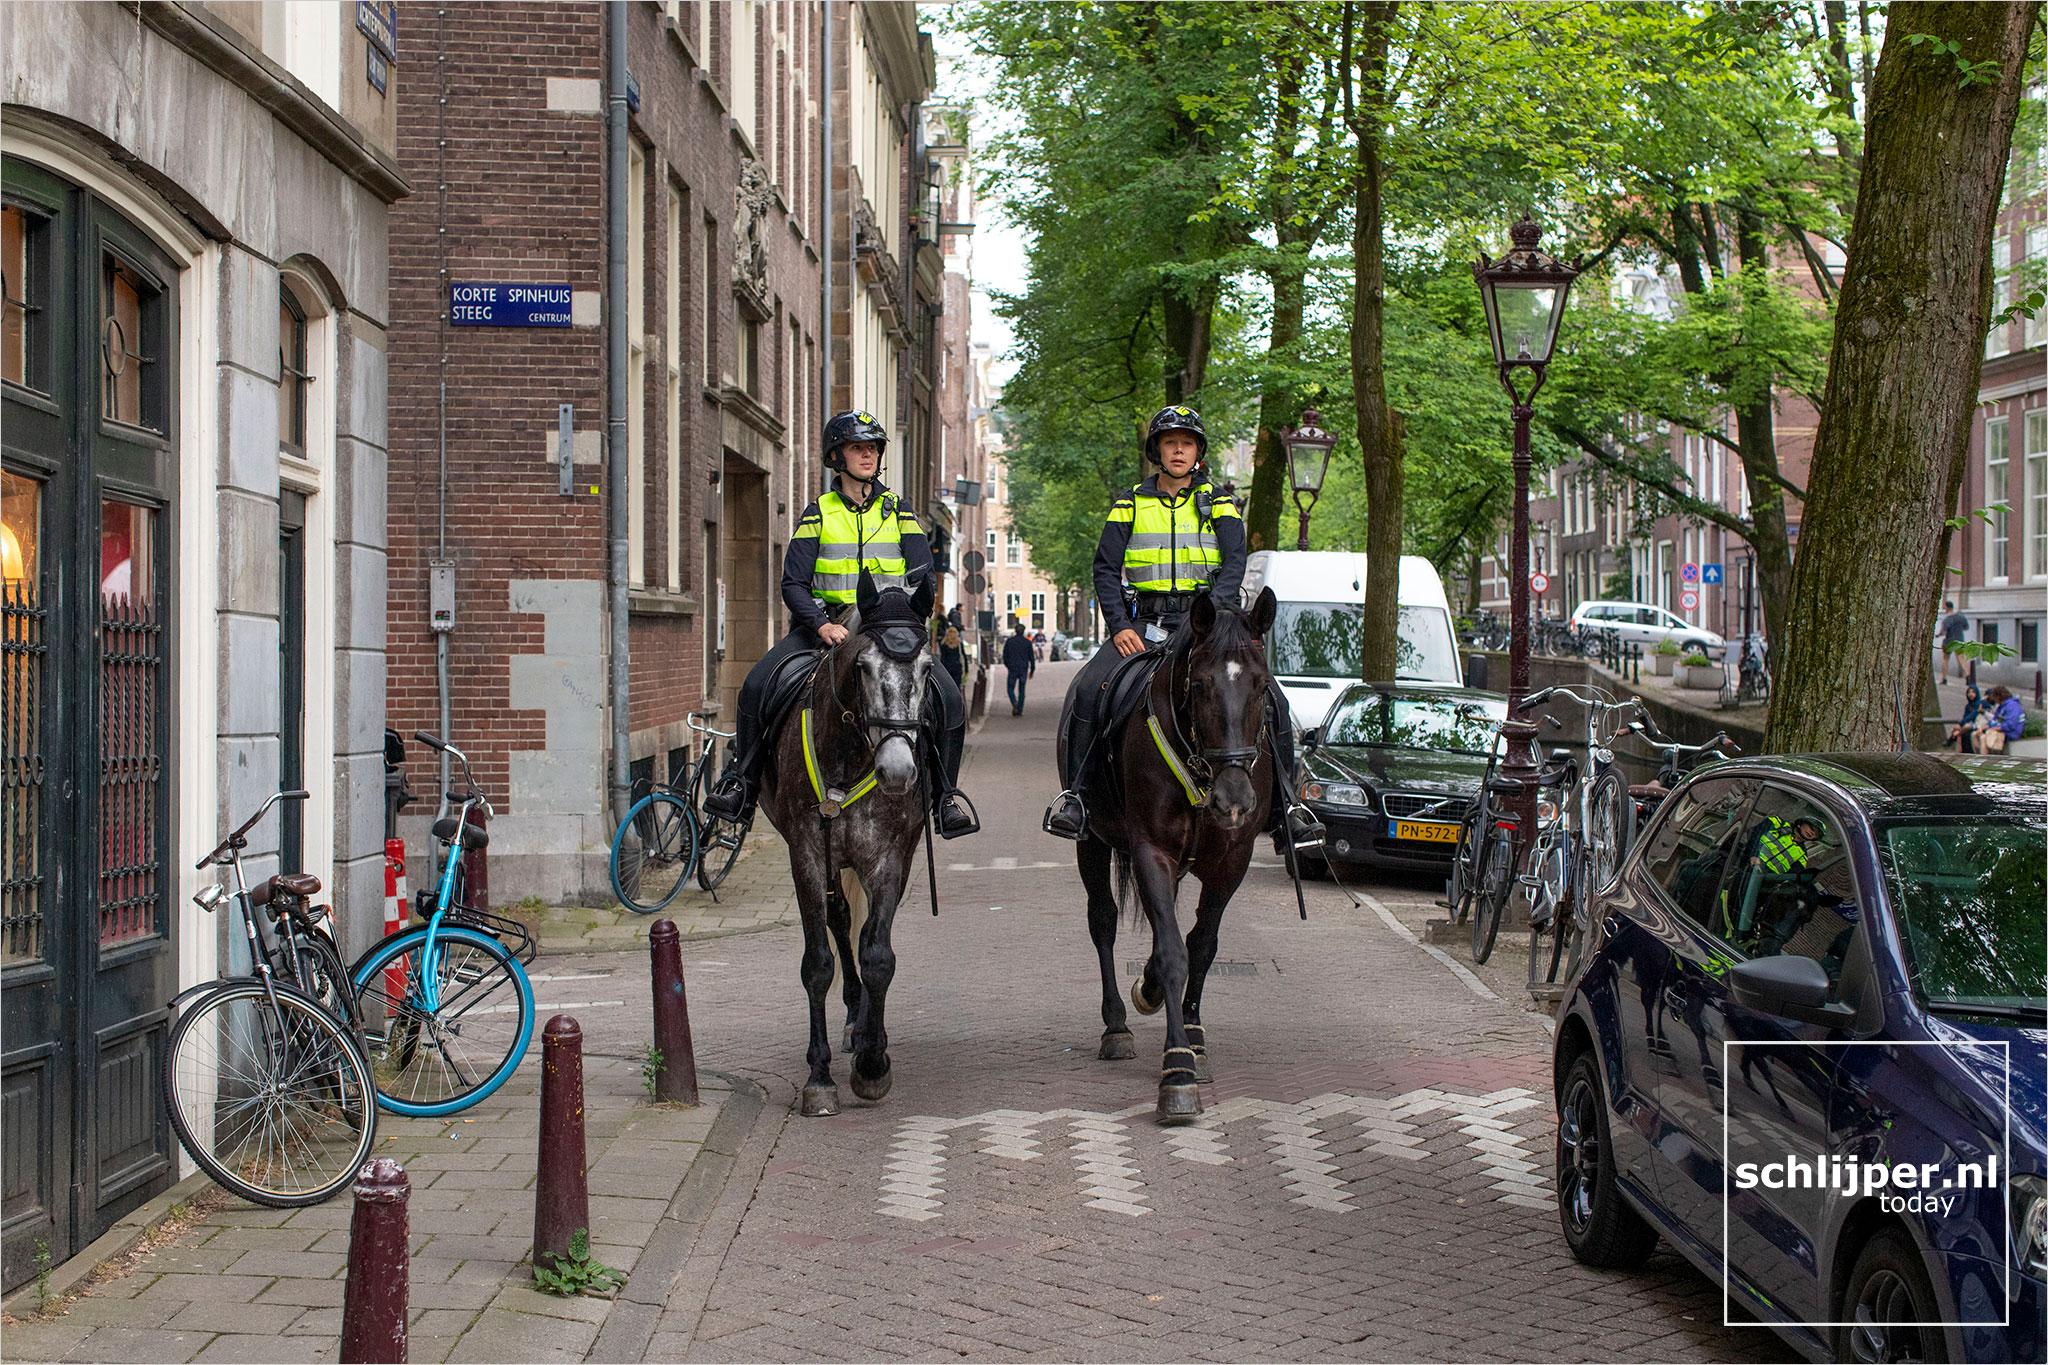 The Netherlands, Amsterdam, 19 juni 2021